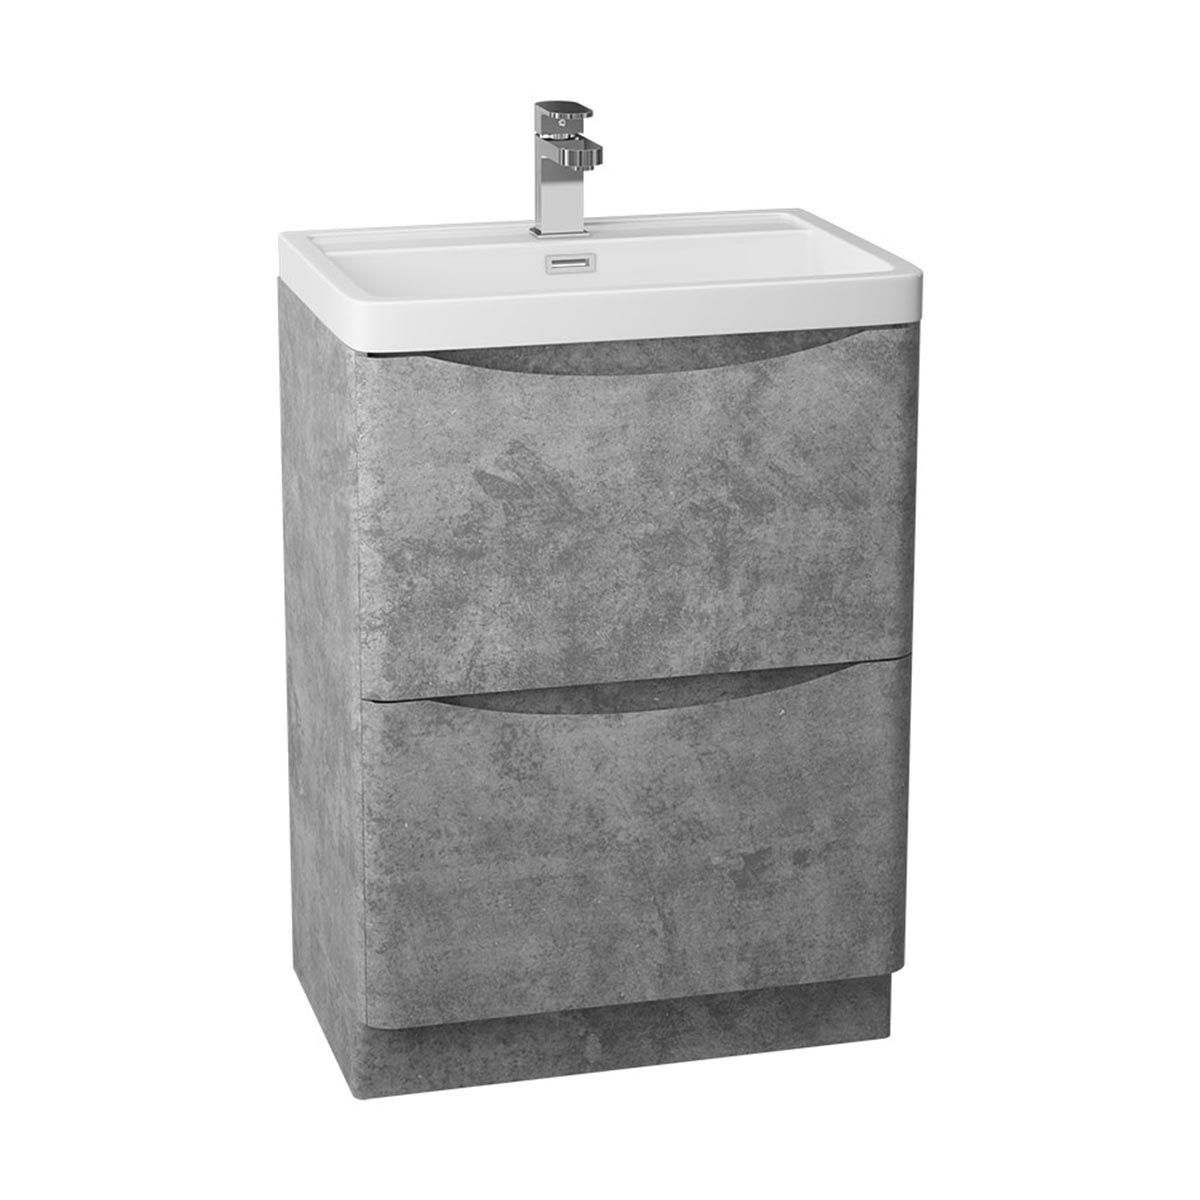 Bali Concrete Grey Floor Standing Vanity Unit with Ceramic Basin 600mm